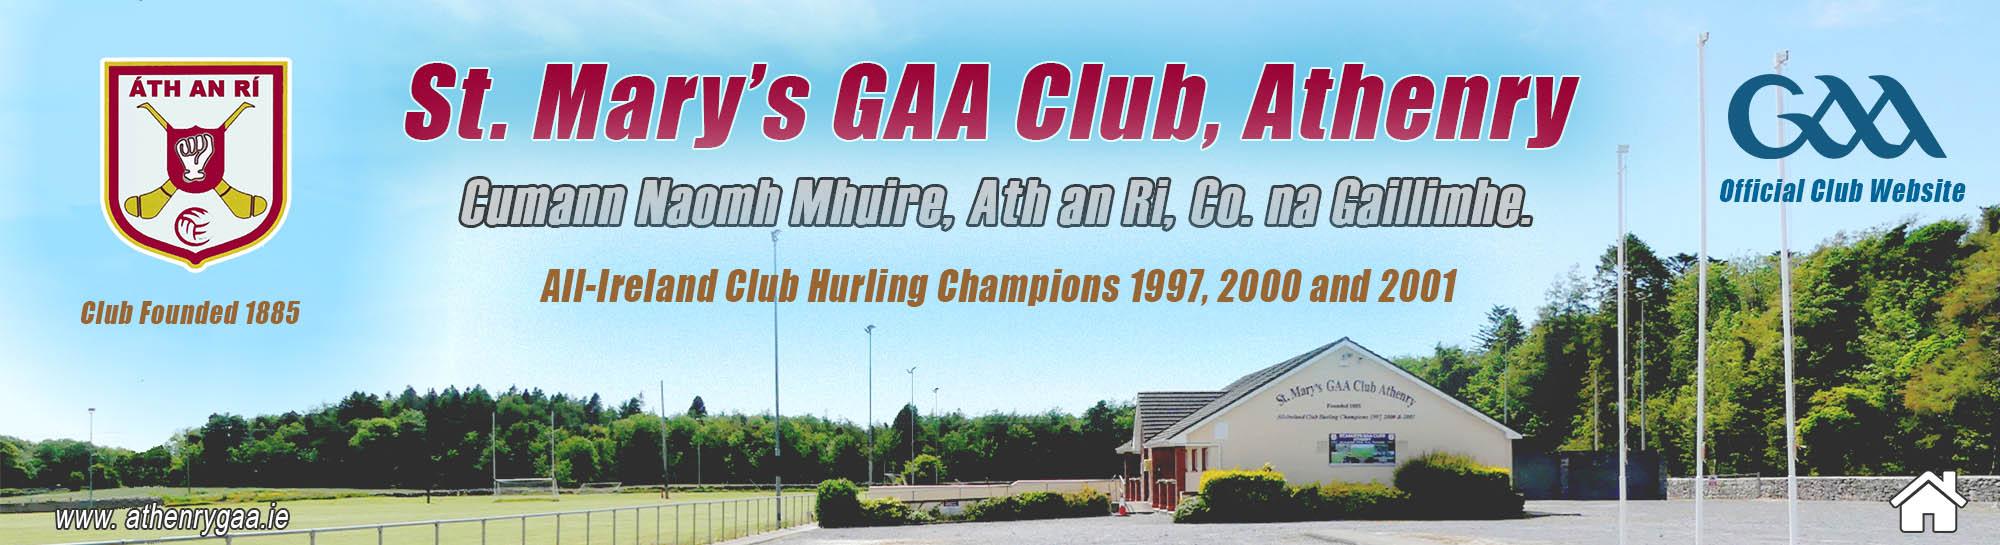 Athenry GAA Club